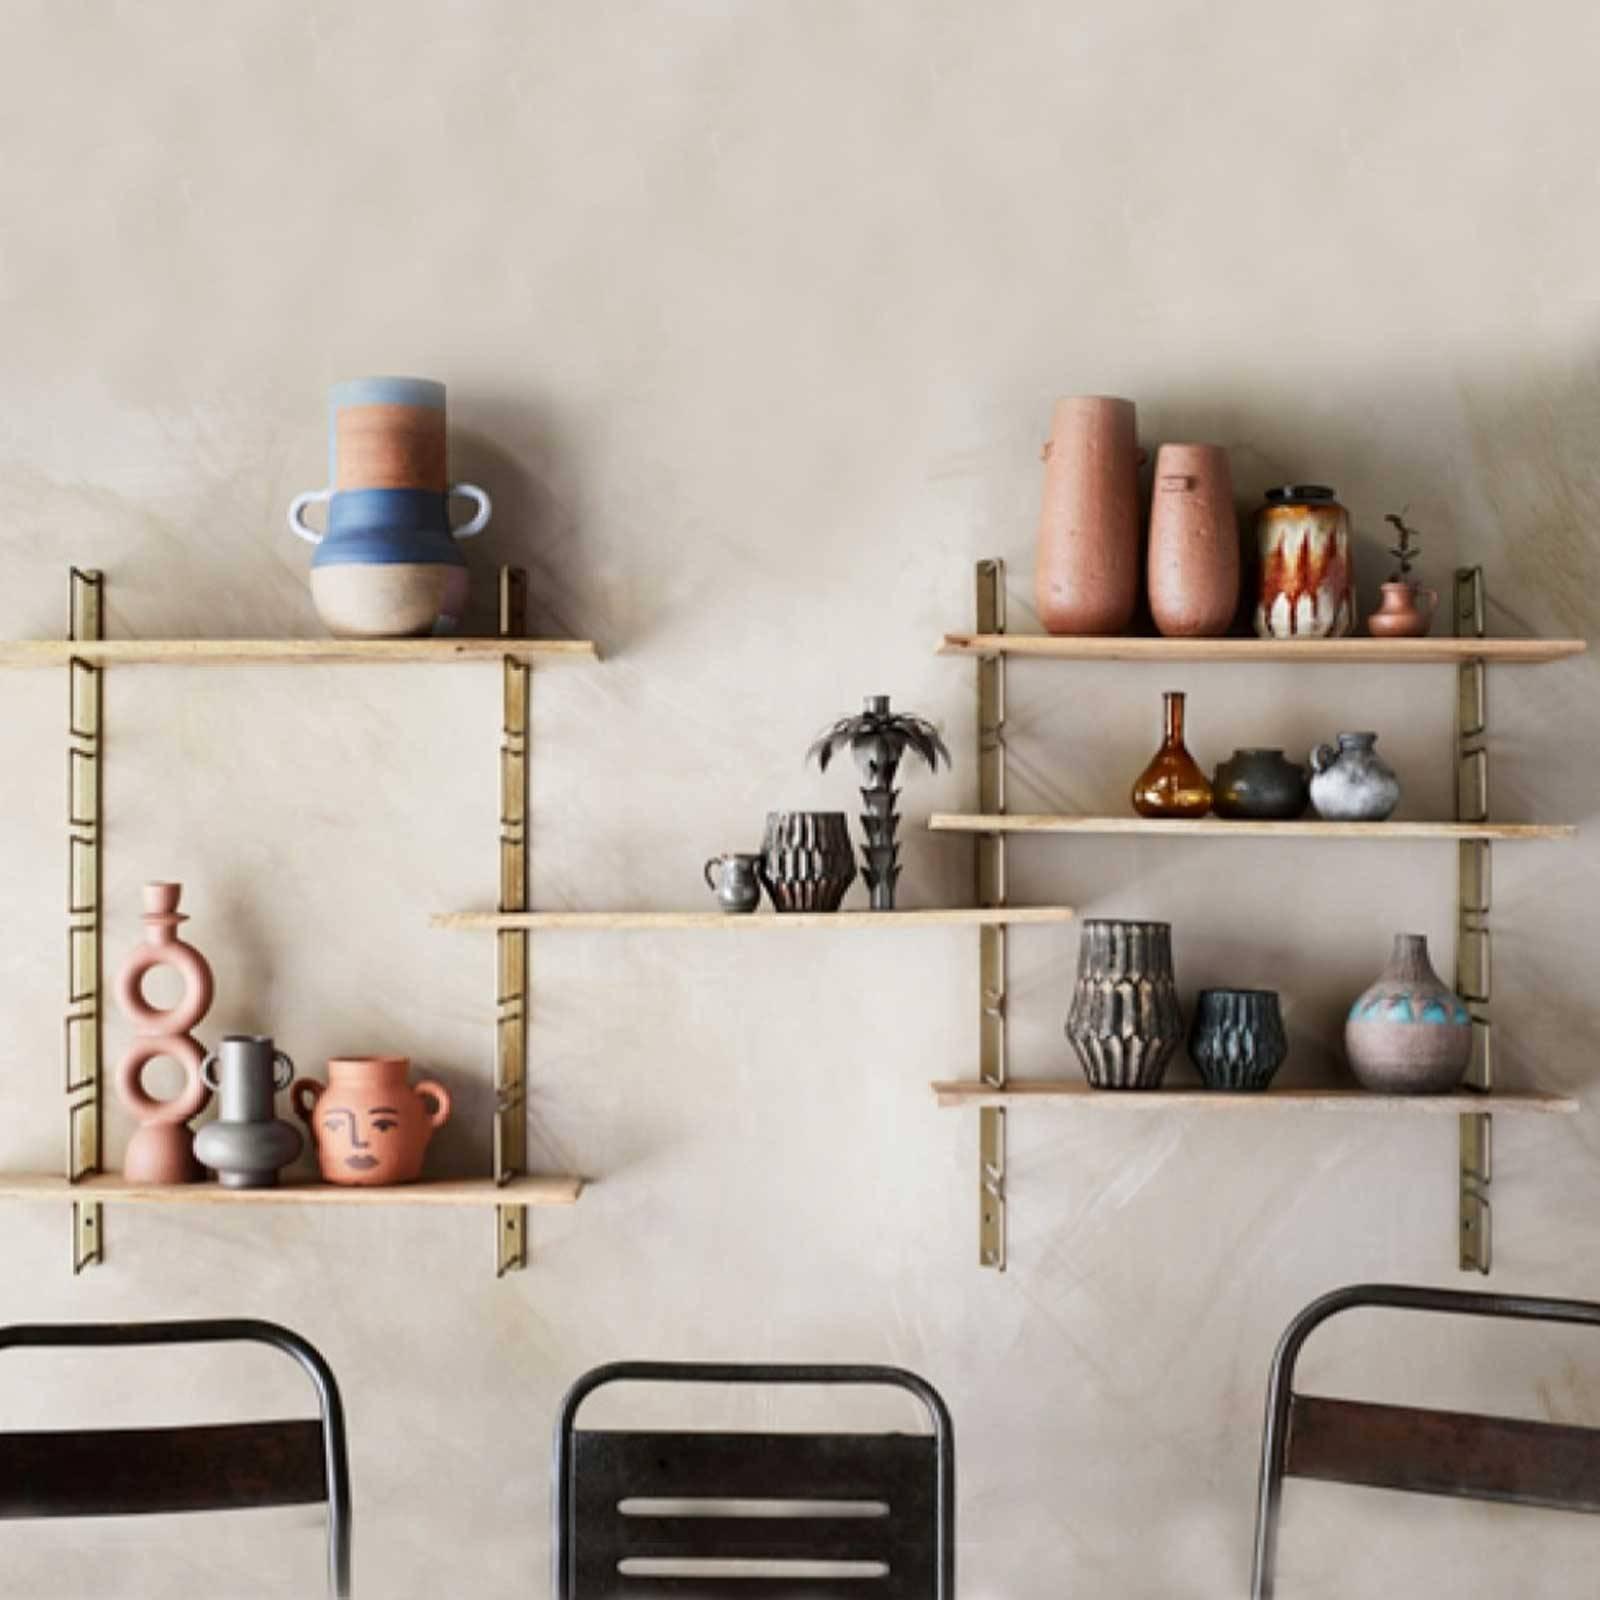 Brass Shelving Unit With 3 Adjustable Wooden Shelves